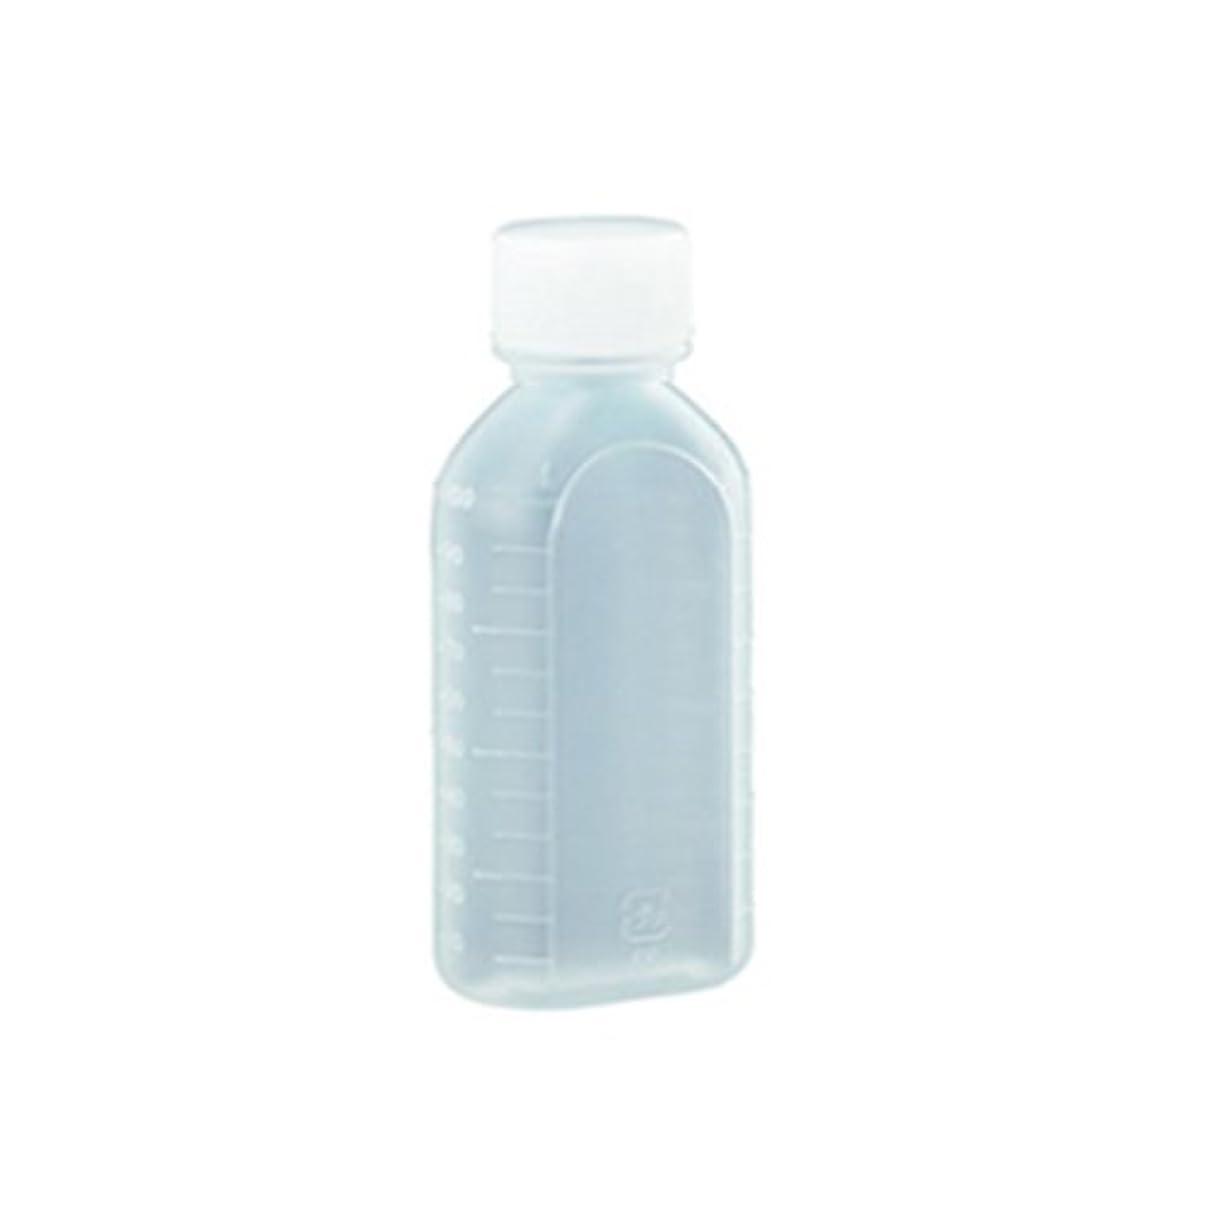 B型投薬瓶 白 (60ml) 5本